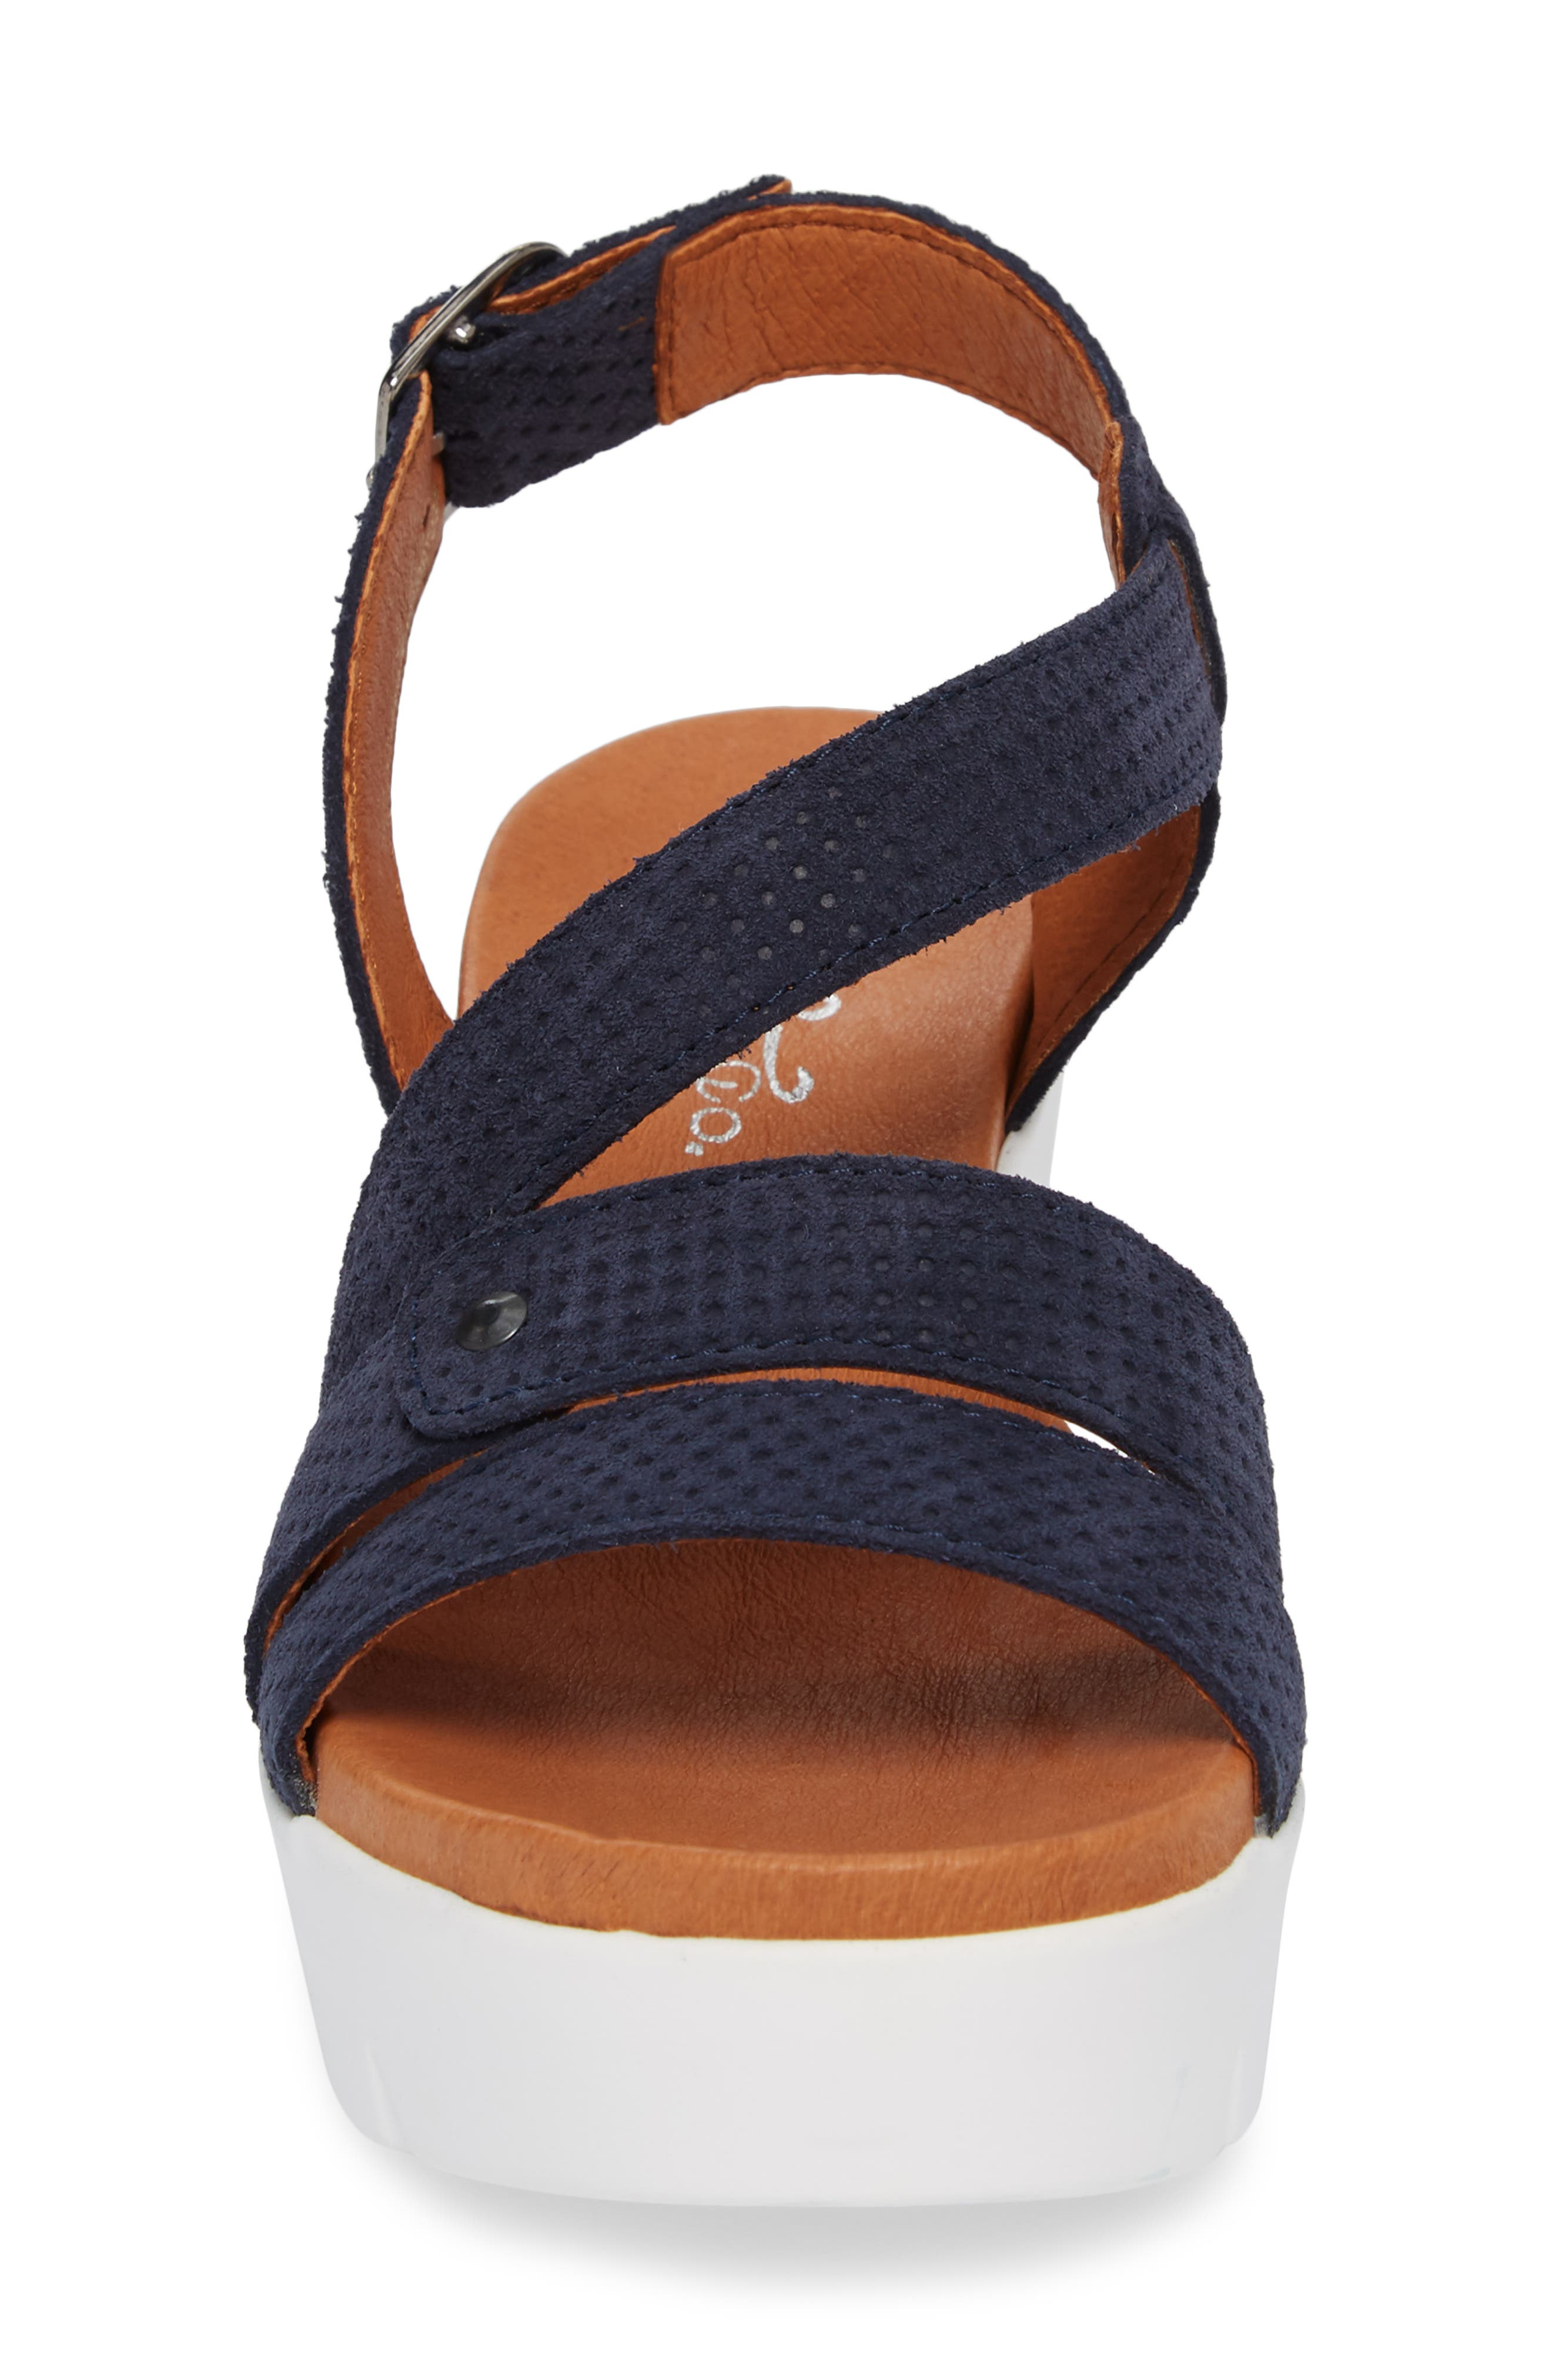 Sierra Platform Wedge Sandal,                             Alternate thumbnail 4, color,                             Blue Leather